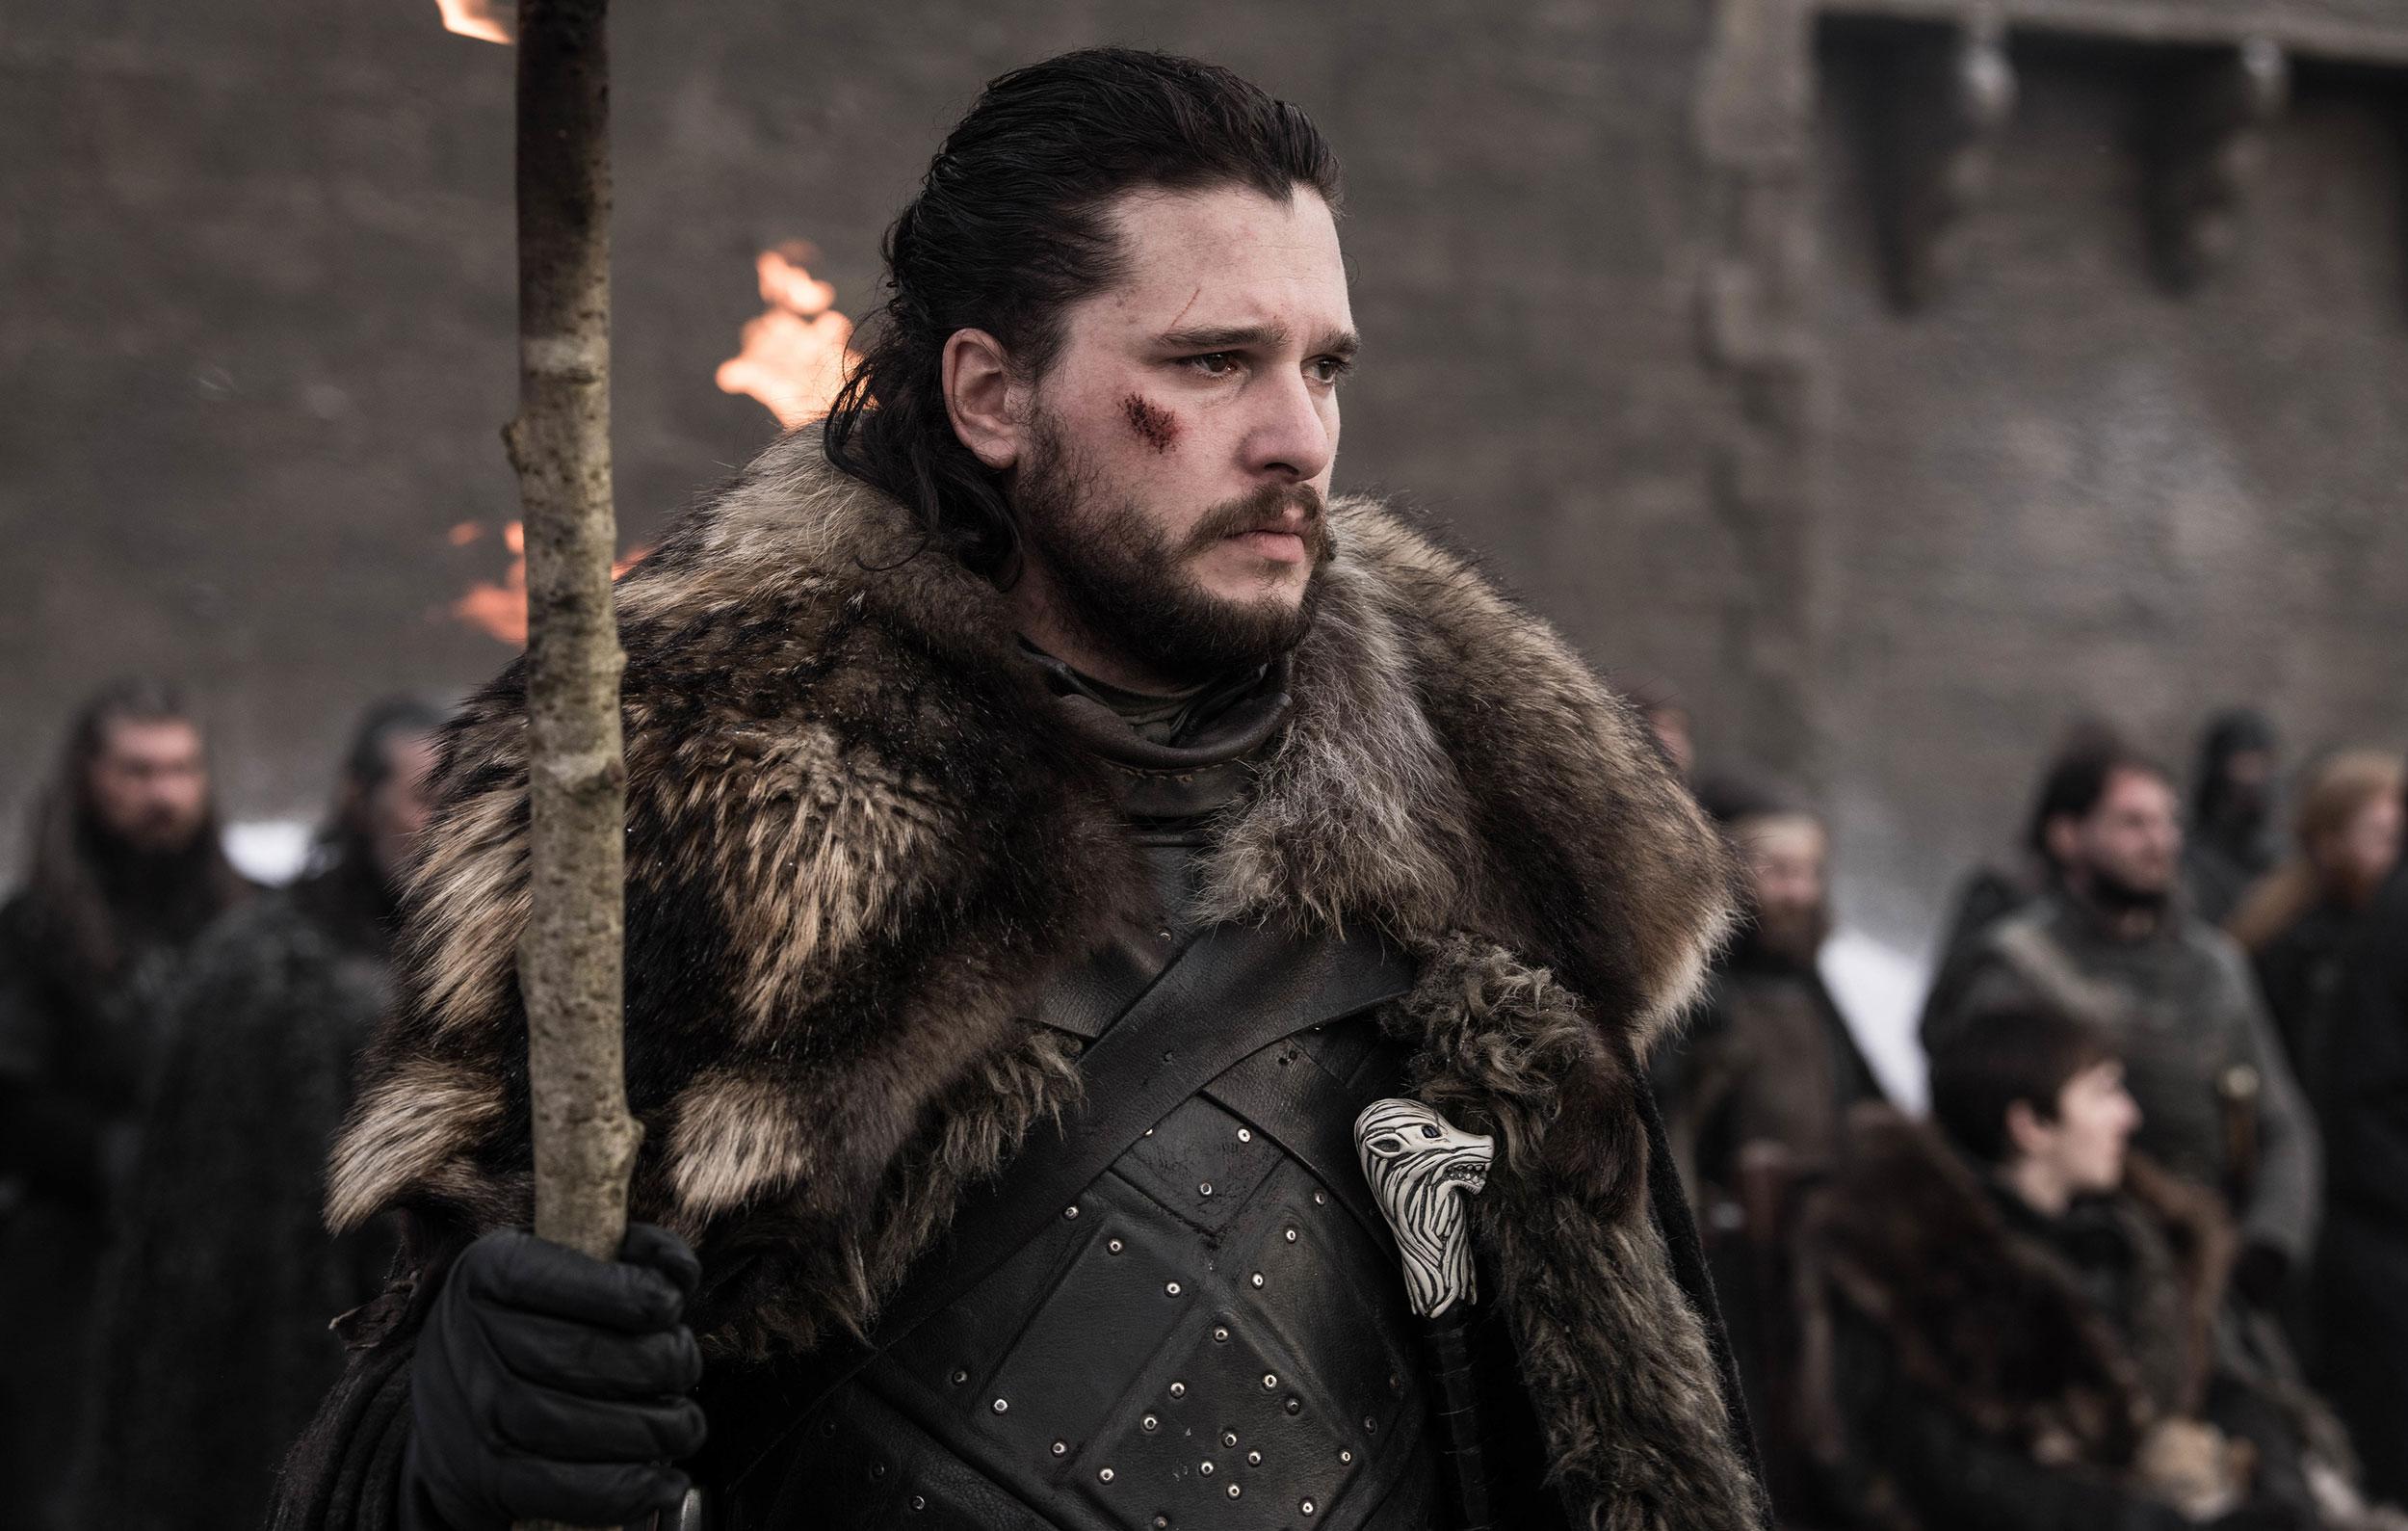 c9fb0d3a33bd0 Game of Thrones Recap  Season 8